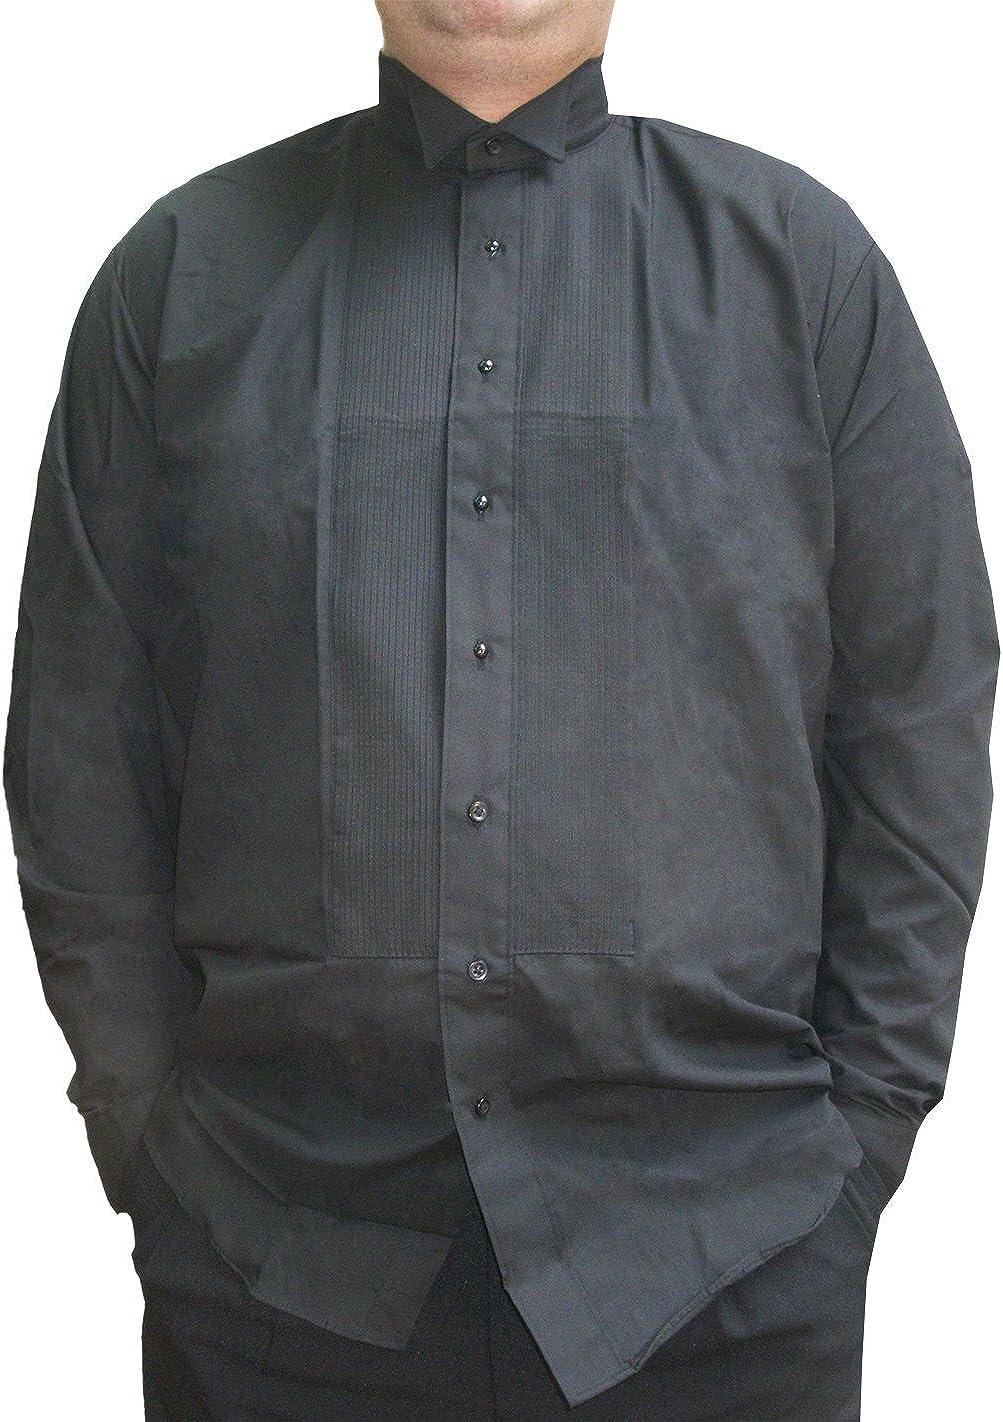 Broadway Tuxmakers Mens Tuxedo Shirt